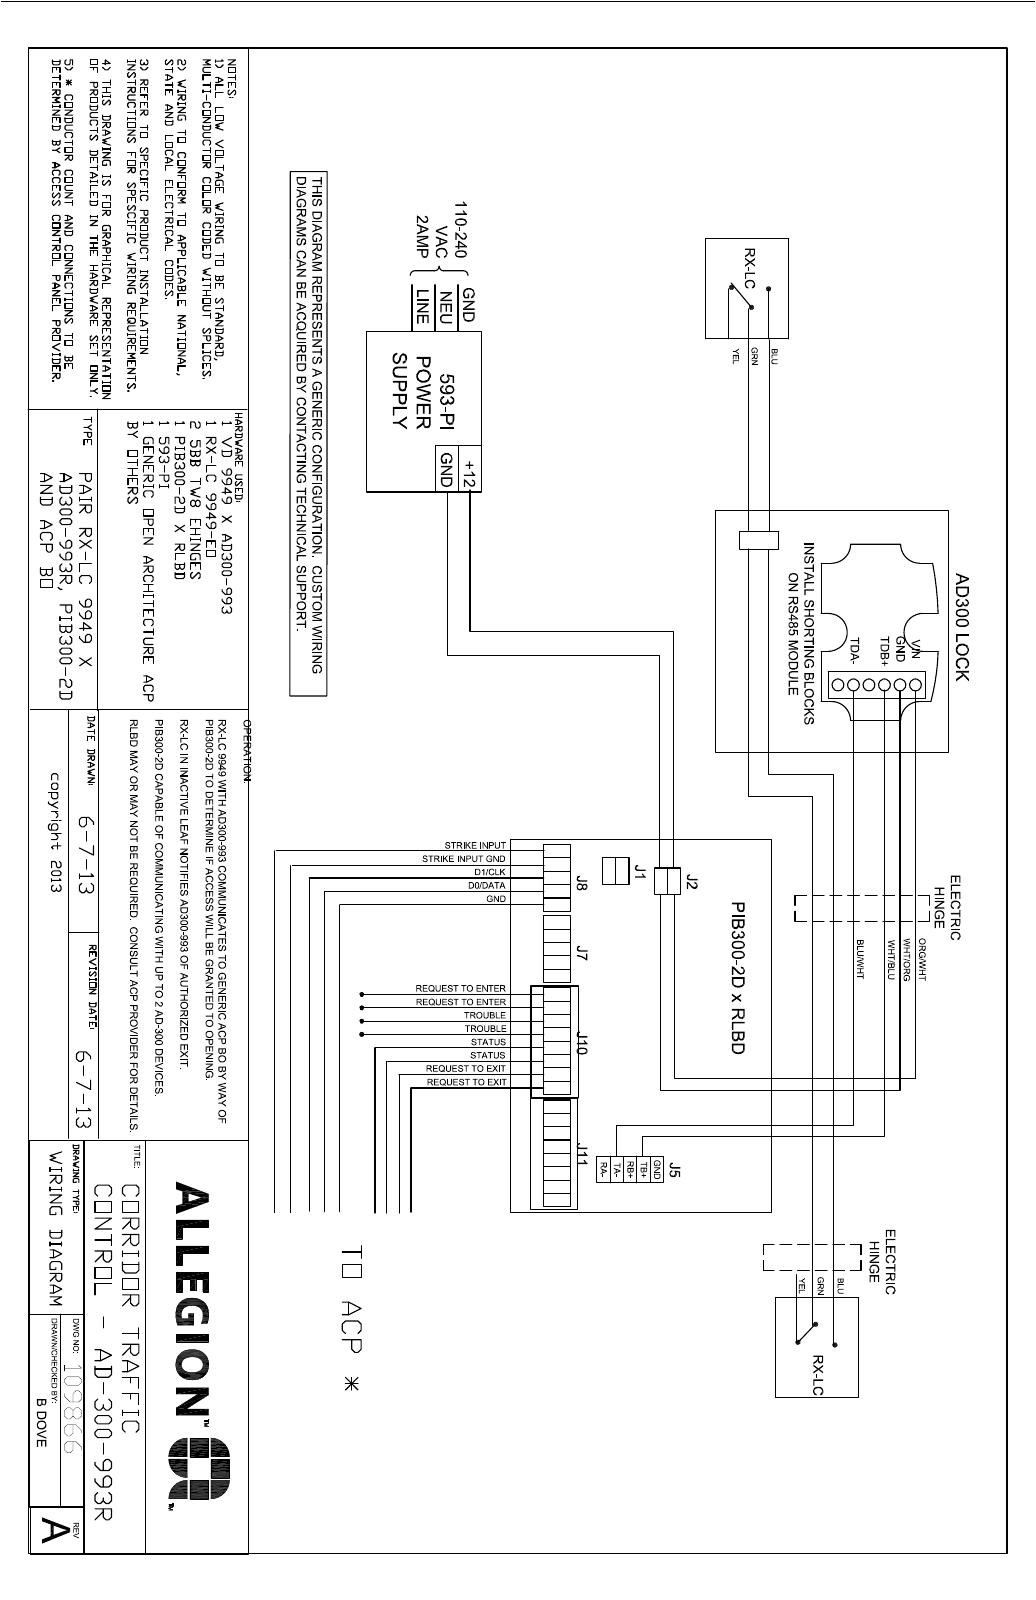 von duprin corridor traffic control application illustration andpage 3 of 3 von duprin corridor traffic control